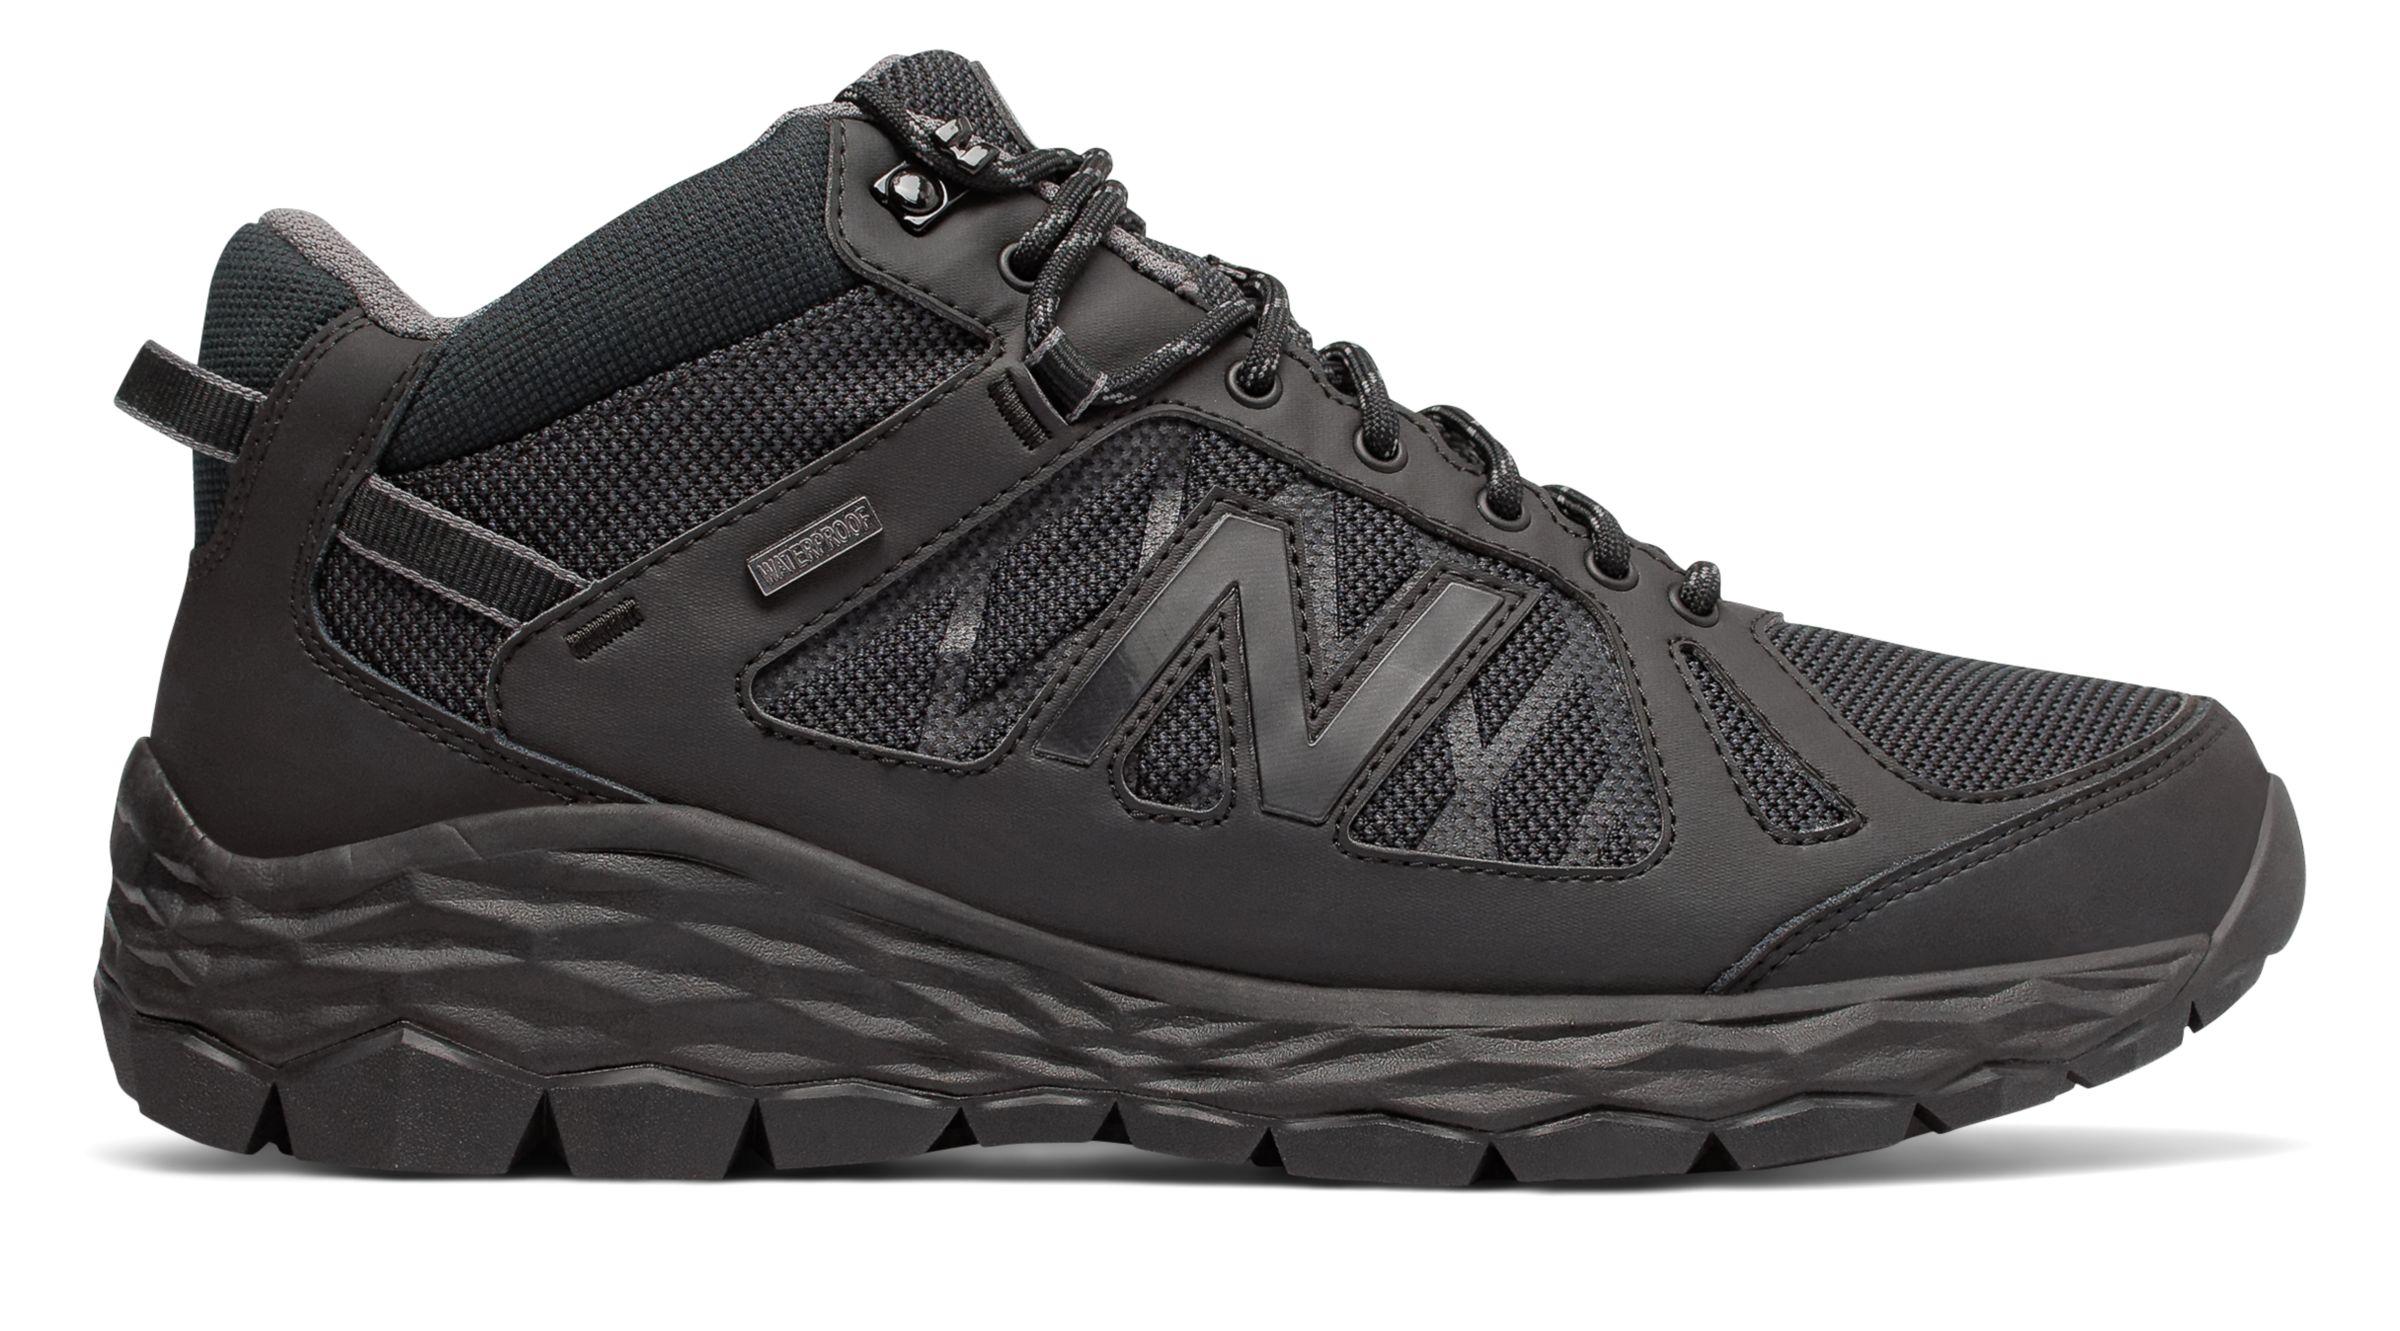 new balance waterproof trail running shoes